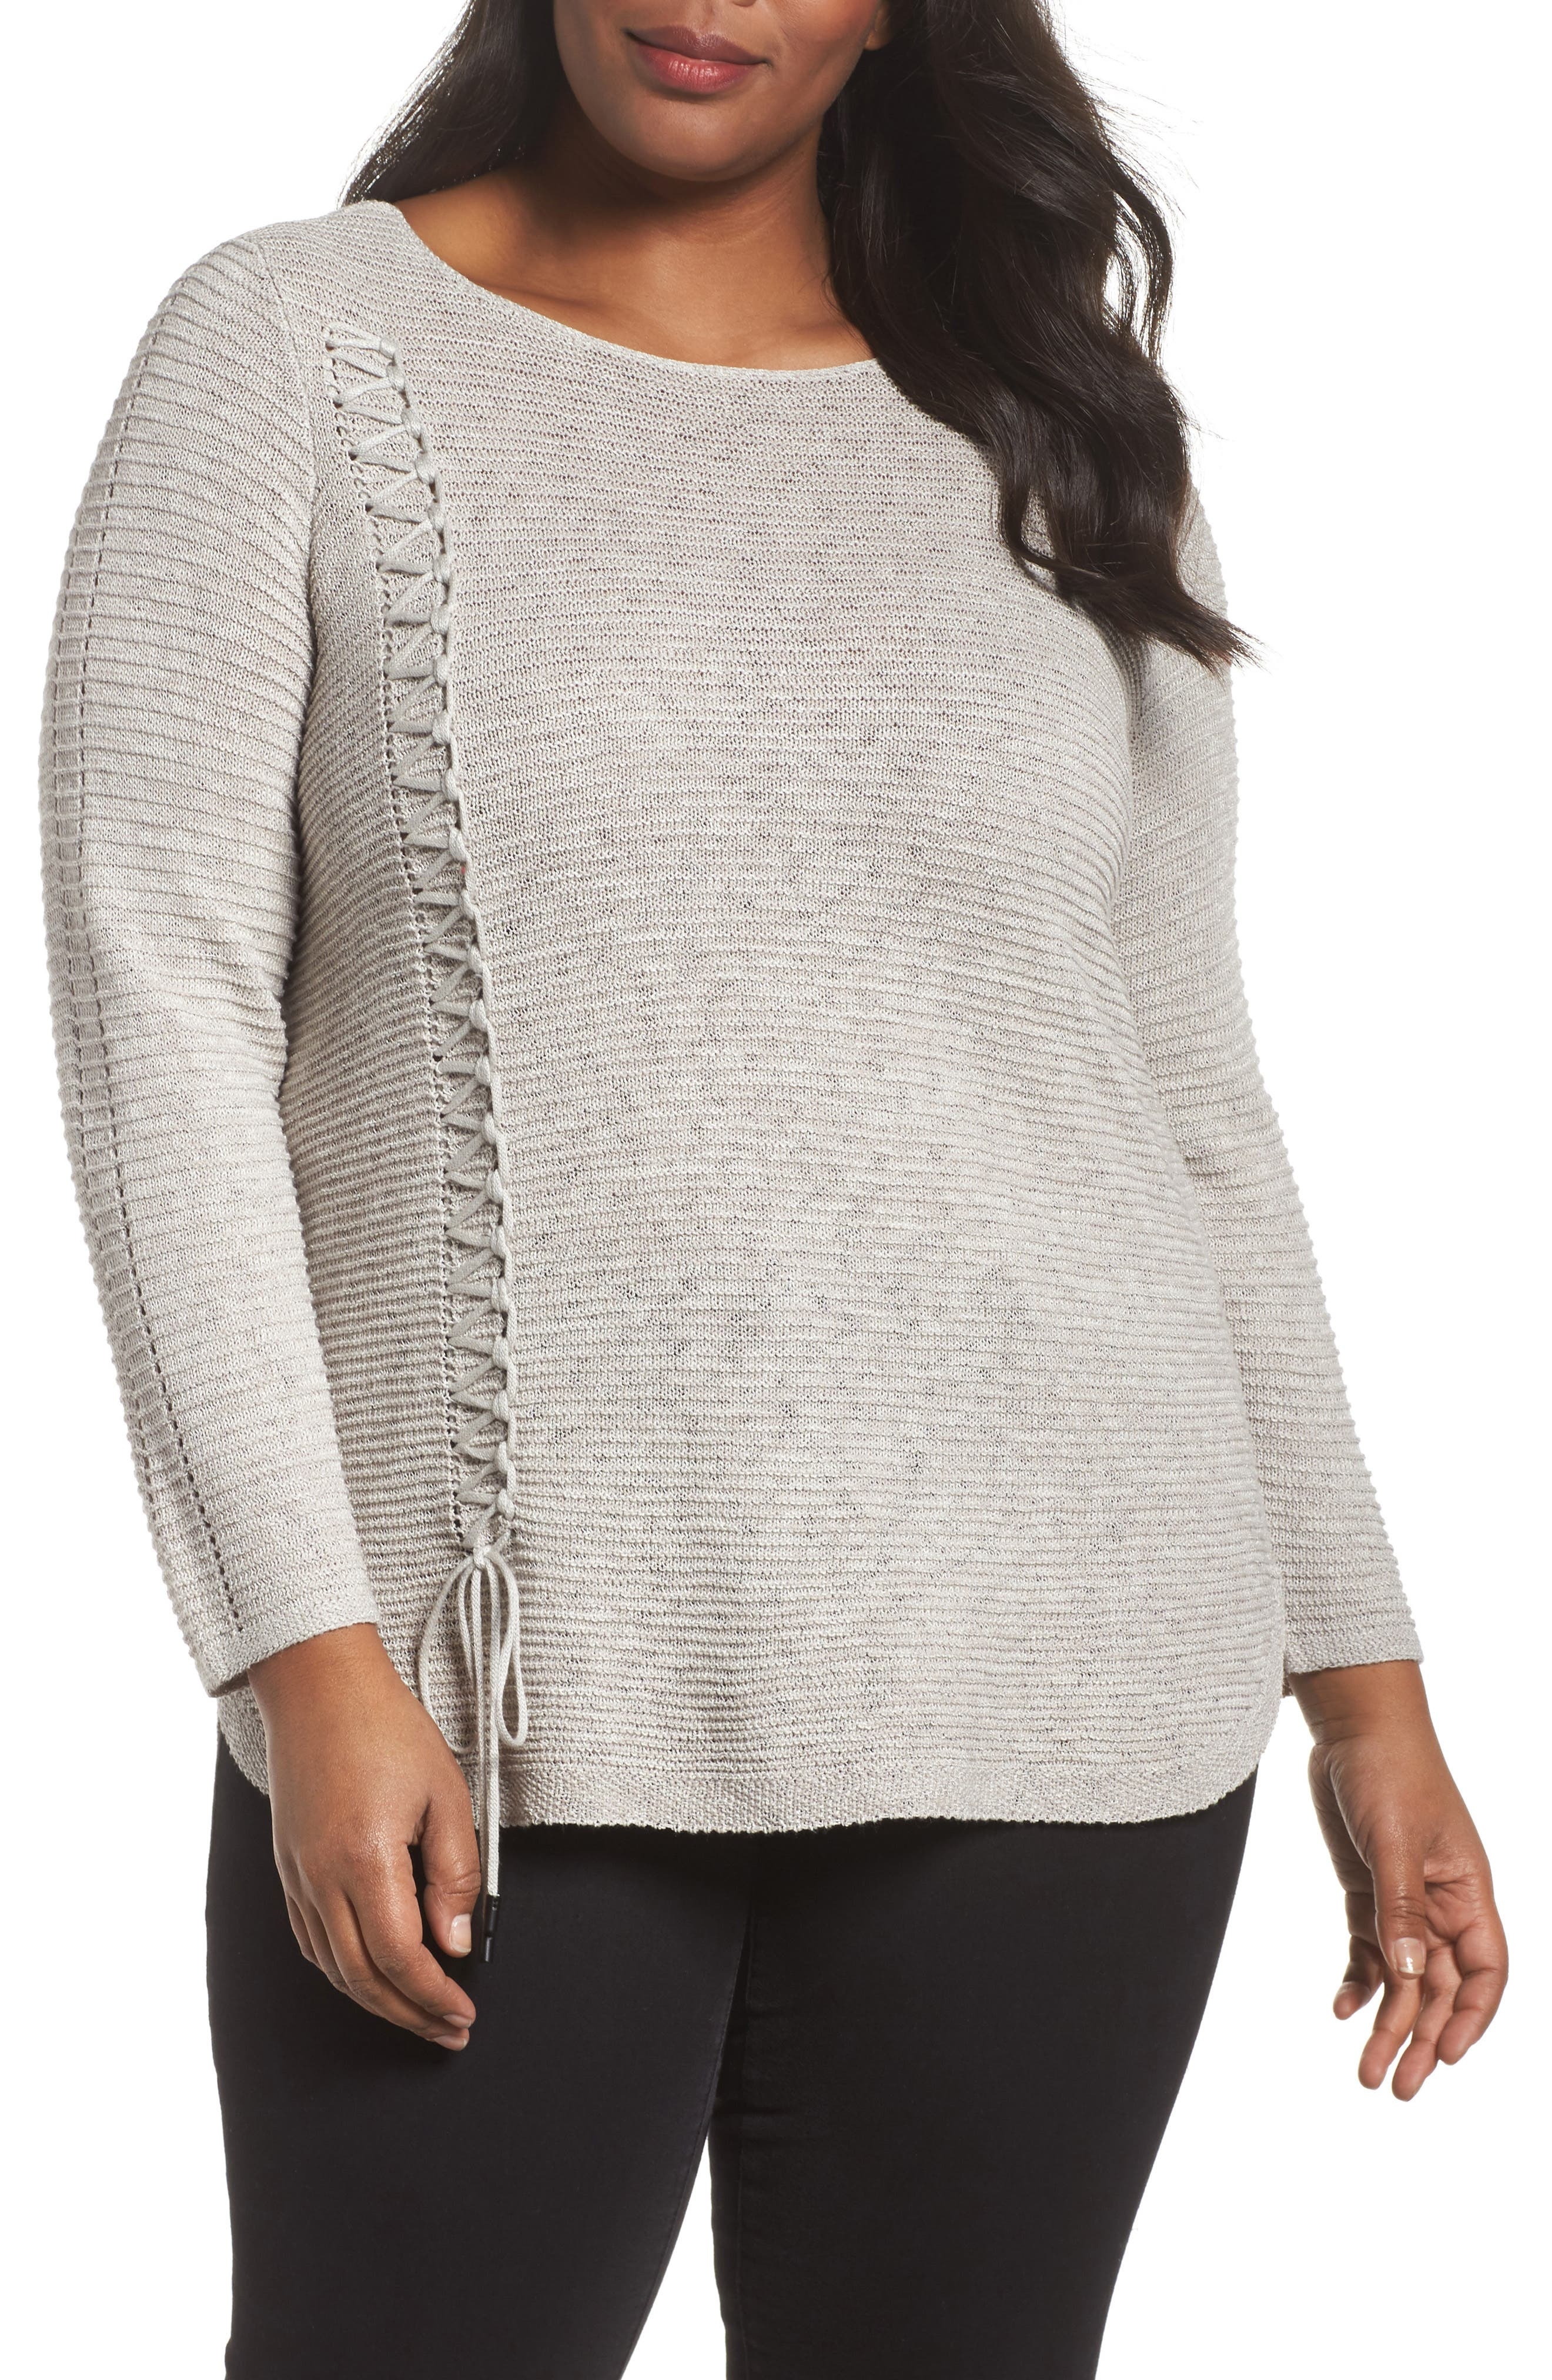 Main Image - NIC+ZOE Braided Up Sweater (Plus Size)